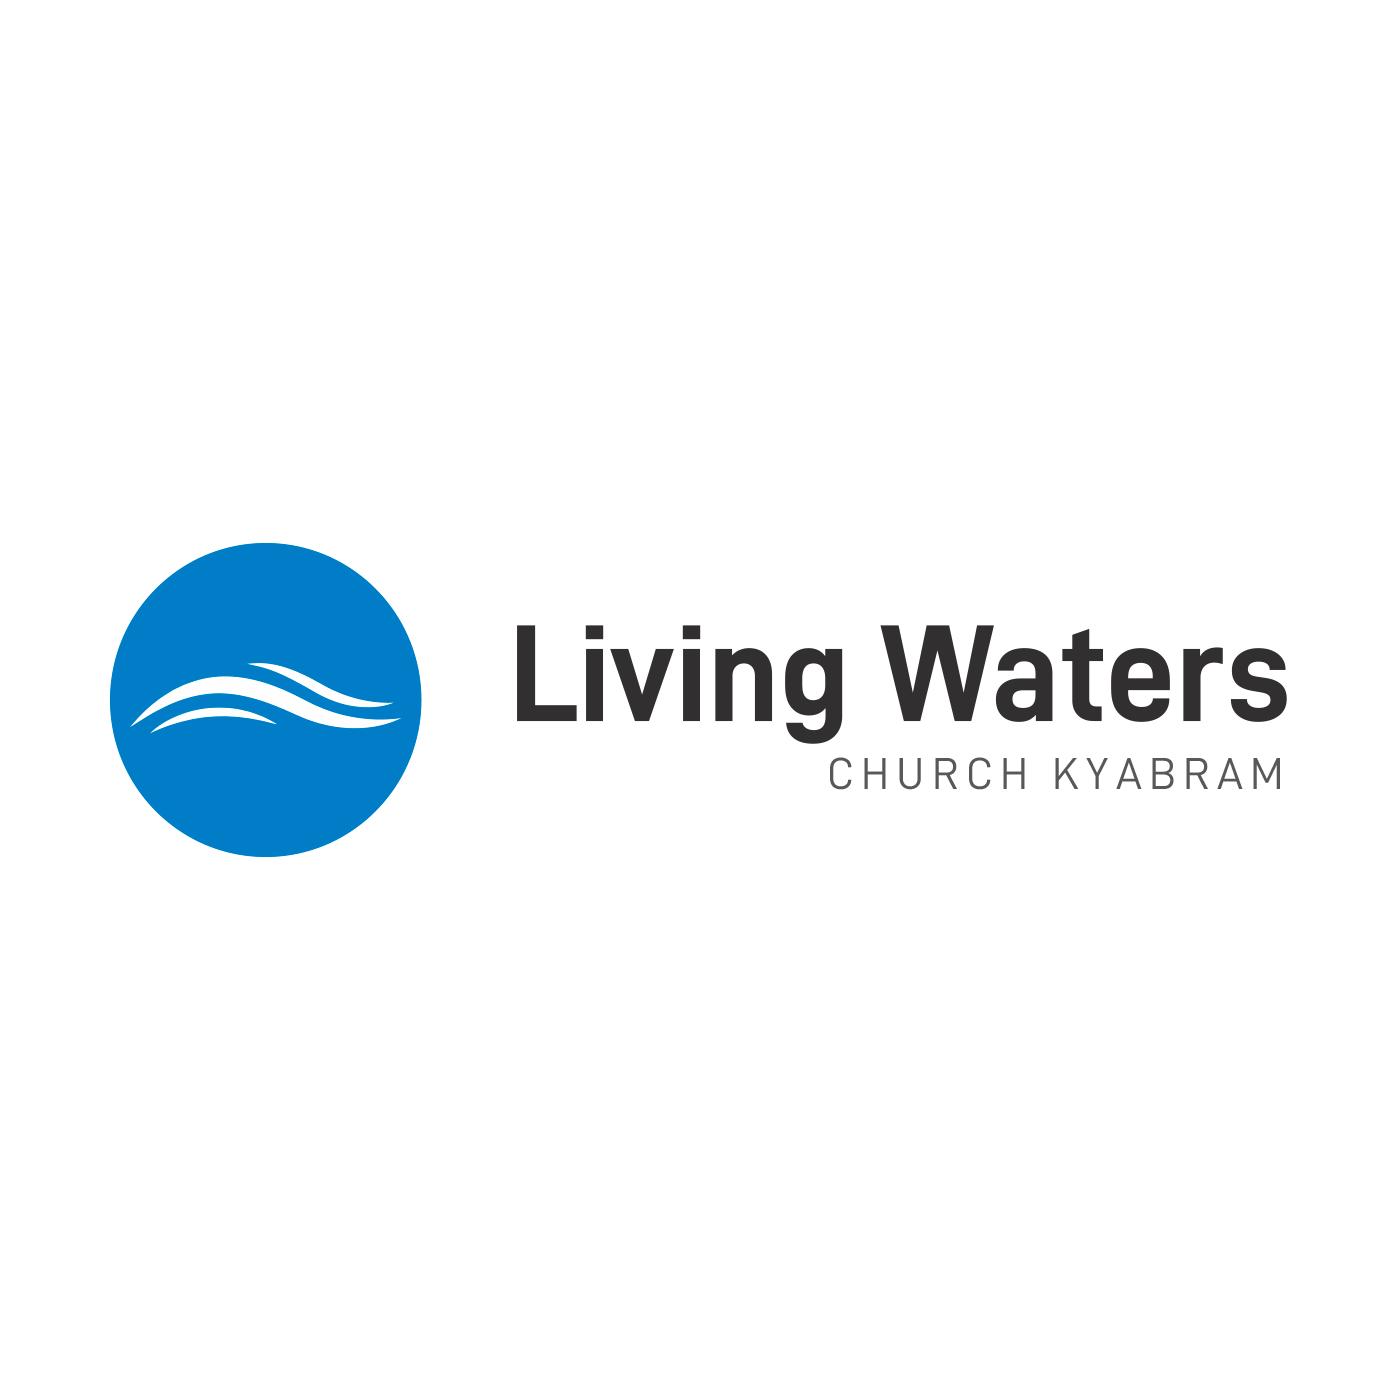 Living Waters Church Kyabram